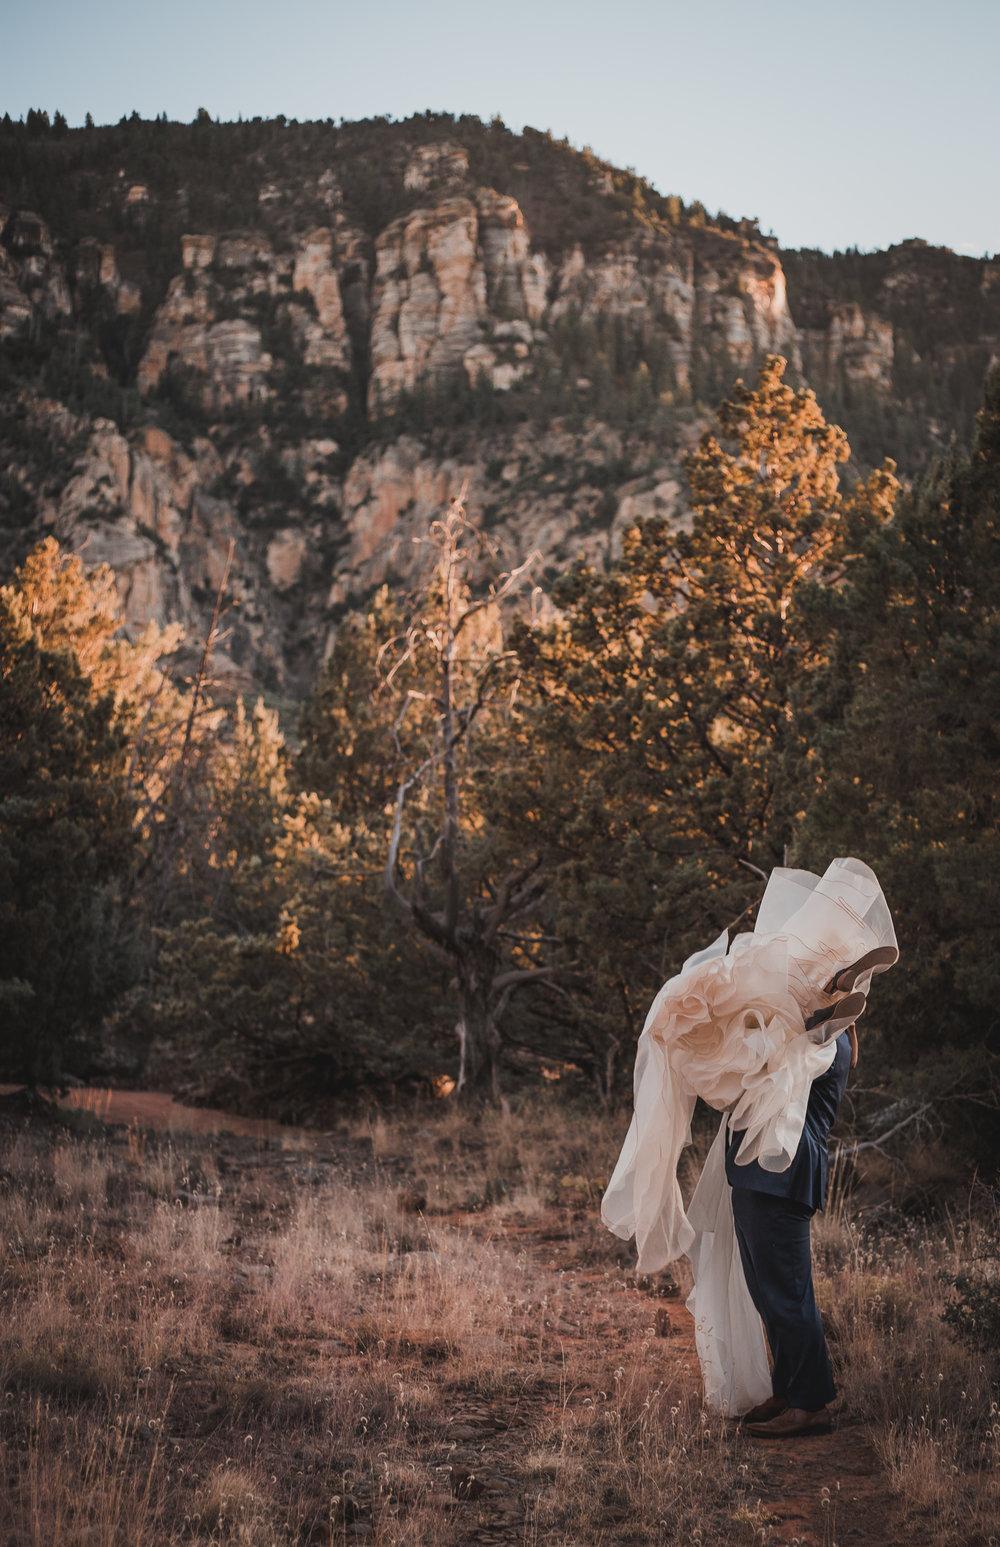 sedona-arizona-canyon-mountain-nationalpark-elopement-adventure-intimate-wedding-photographer-outdoor-national-park-photographer-merrygoroundrock-merry-go-round-rock-schnebly-hill